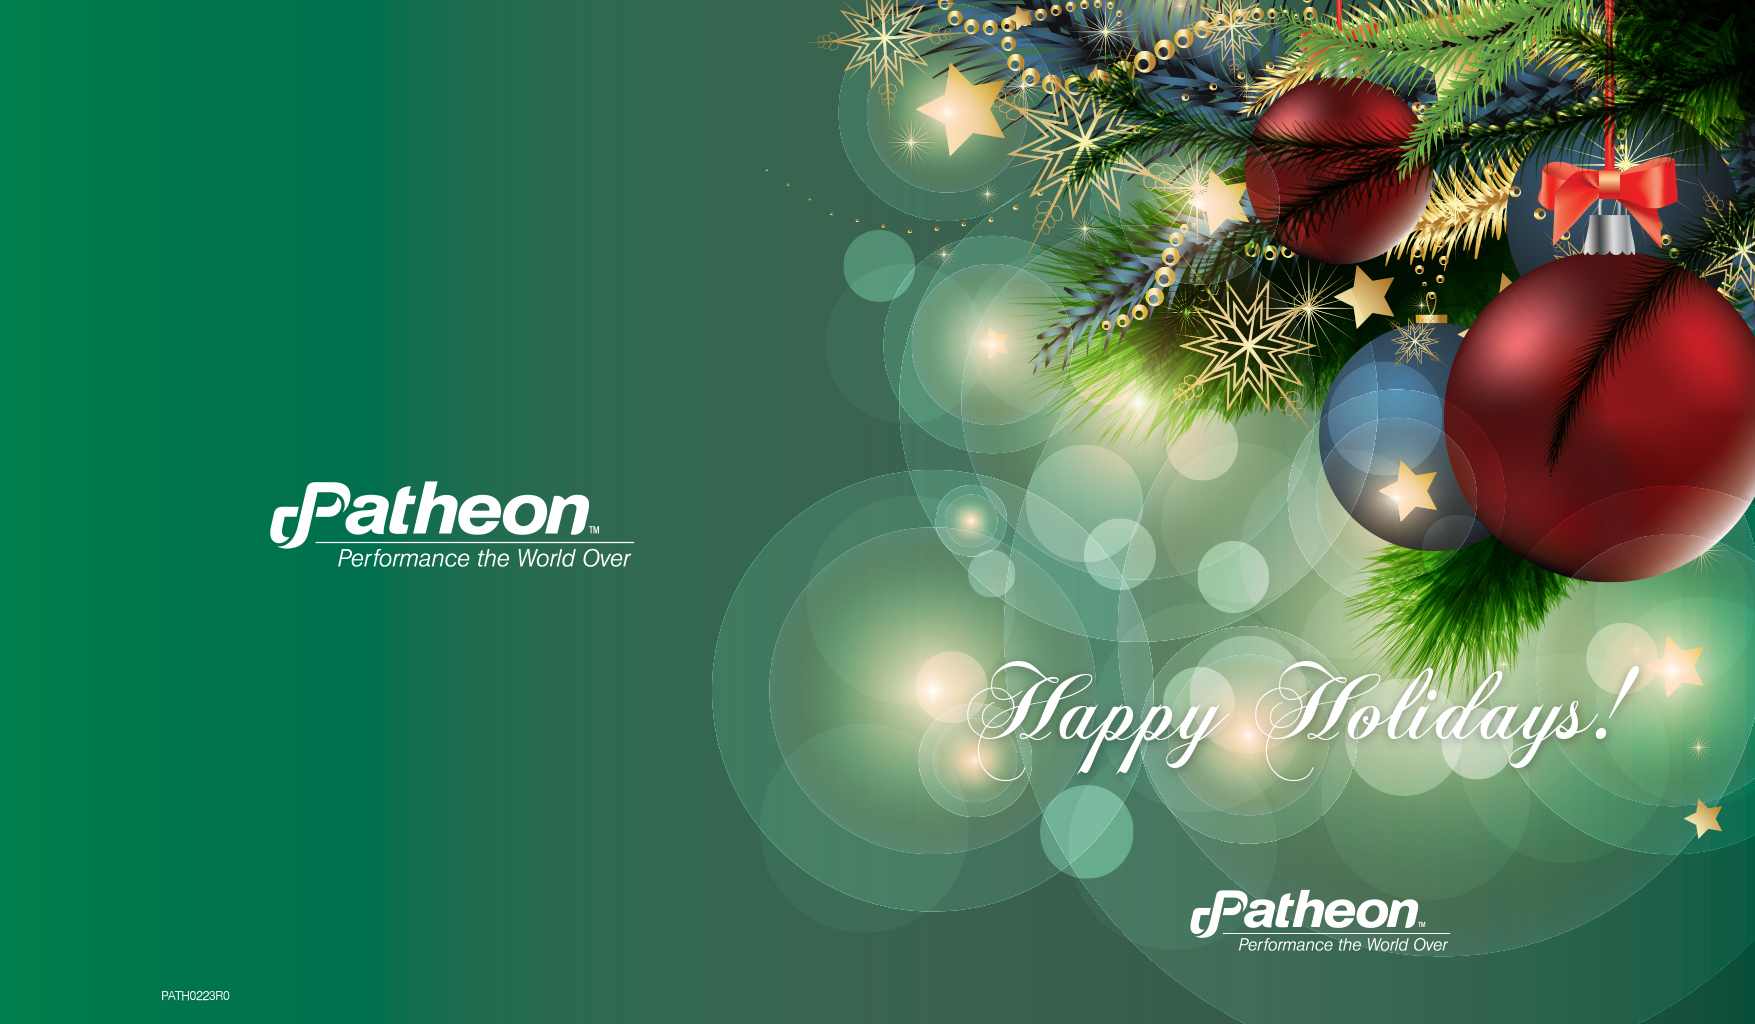 Patheon Holiday Card